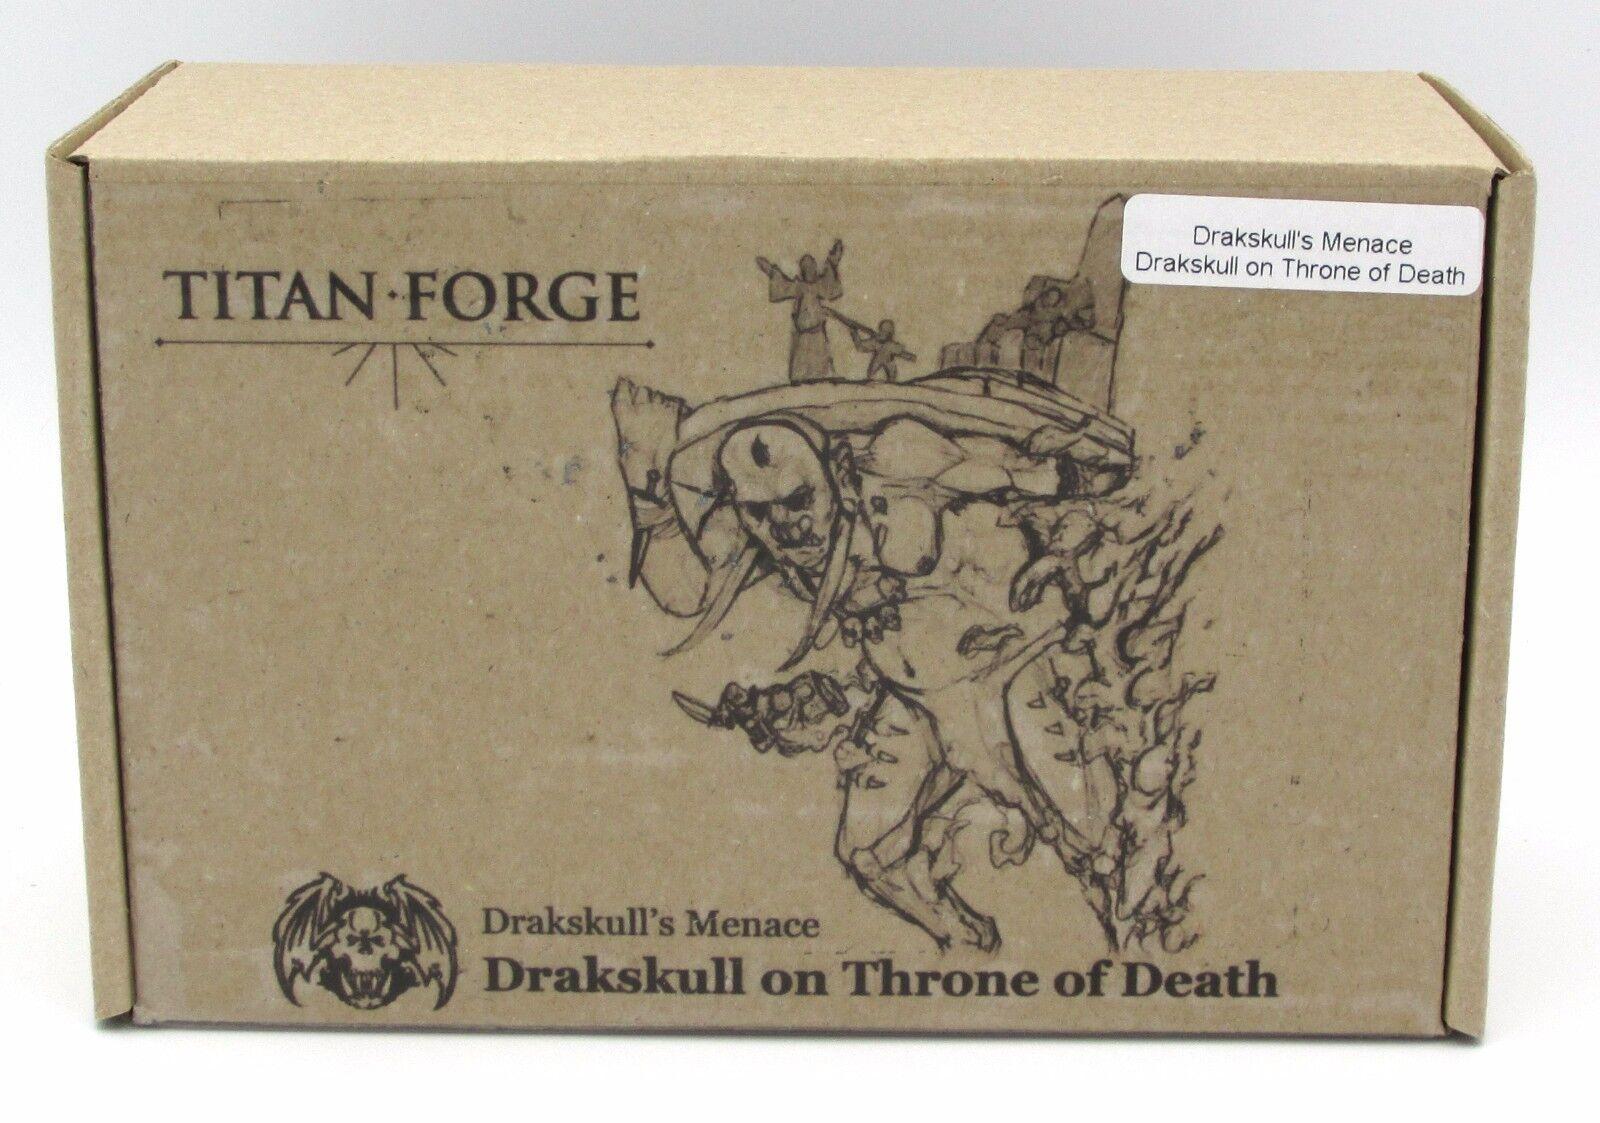 Titan - schmiede tfdm01 drakskull ist gefahr drakskull am thron des todes ork - magier nib